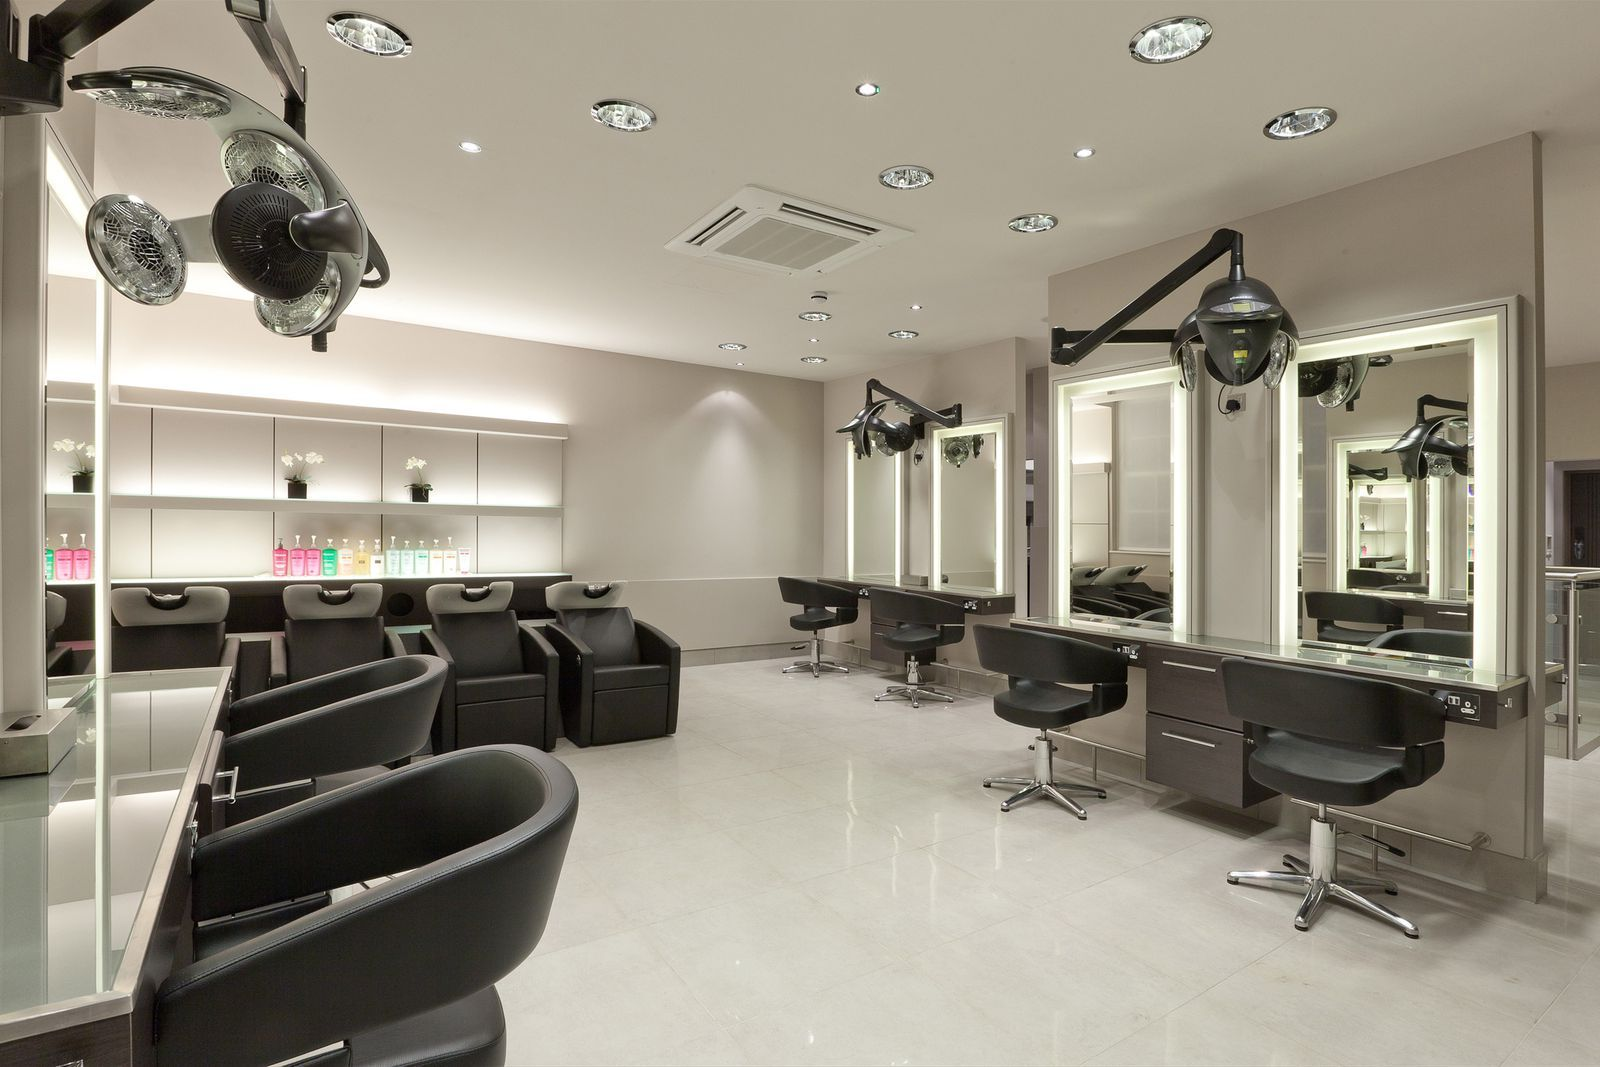 The Best London Hair Salons Salon Interior Design Salon